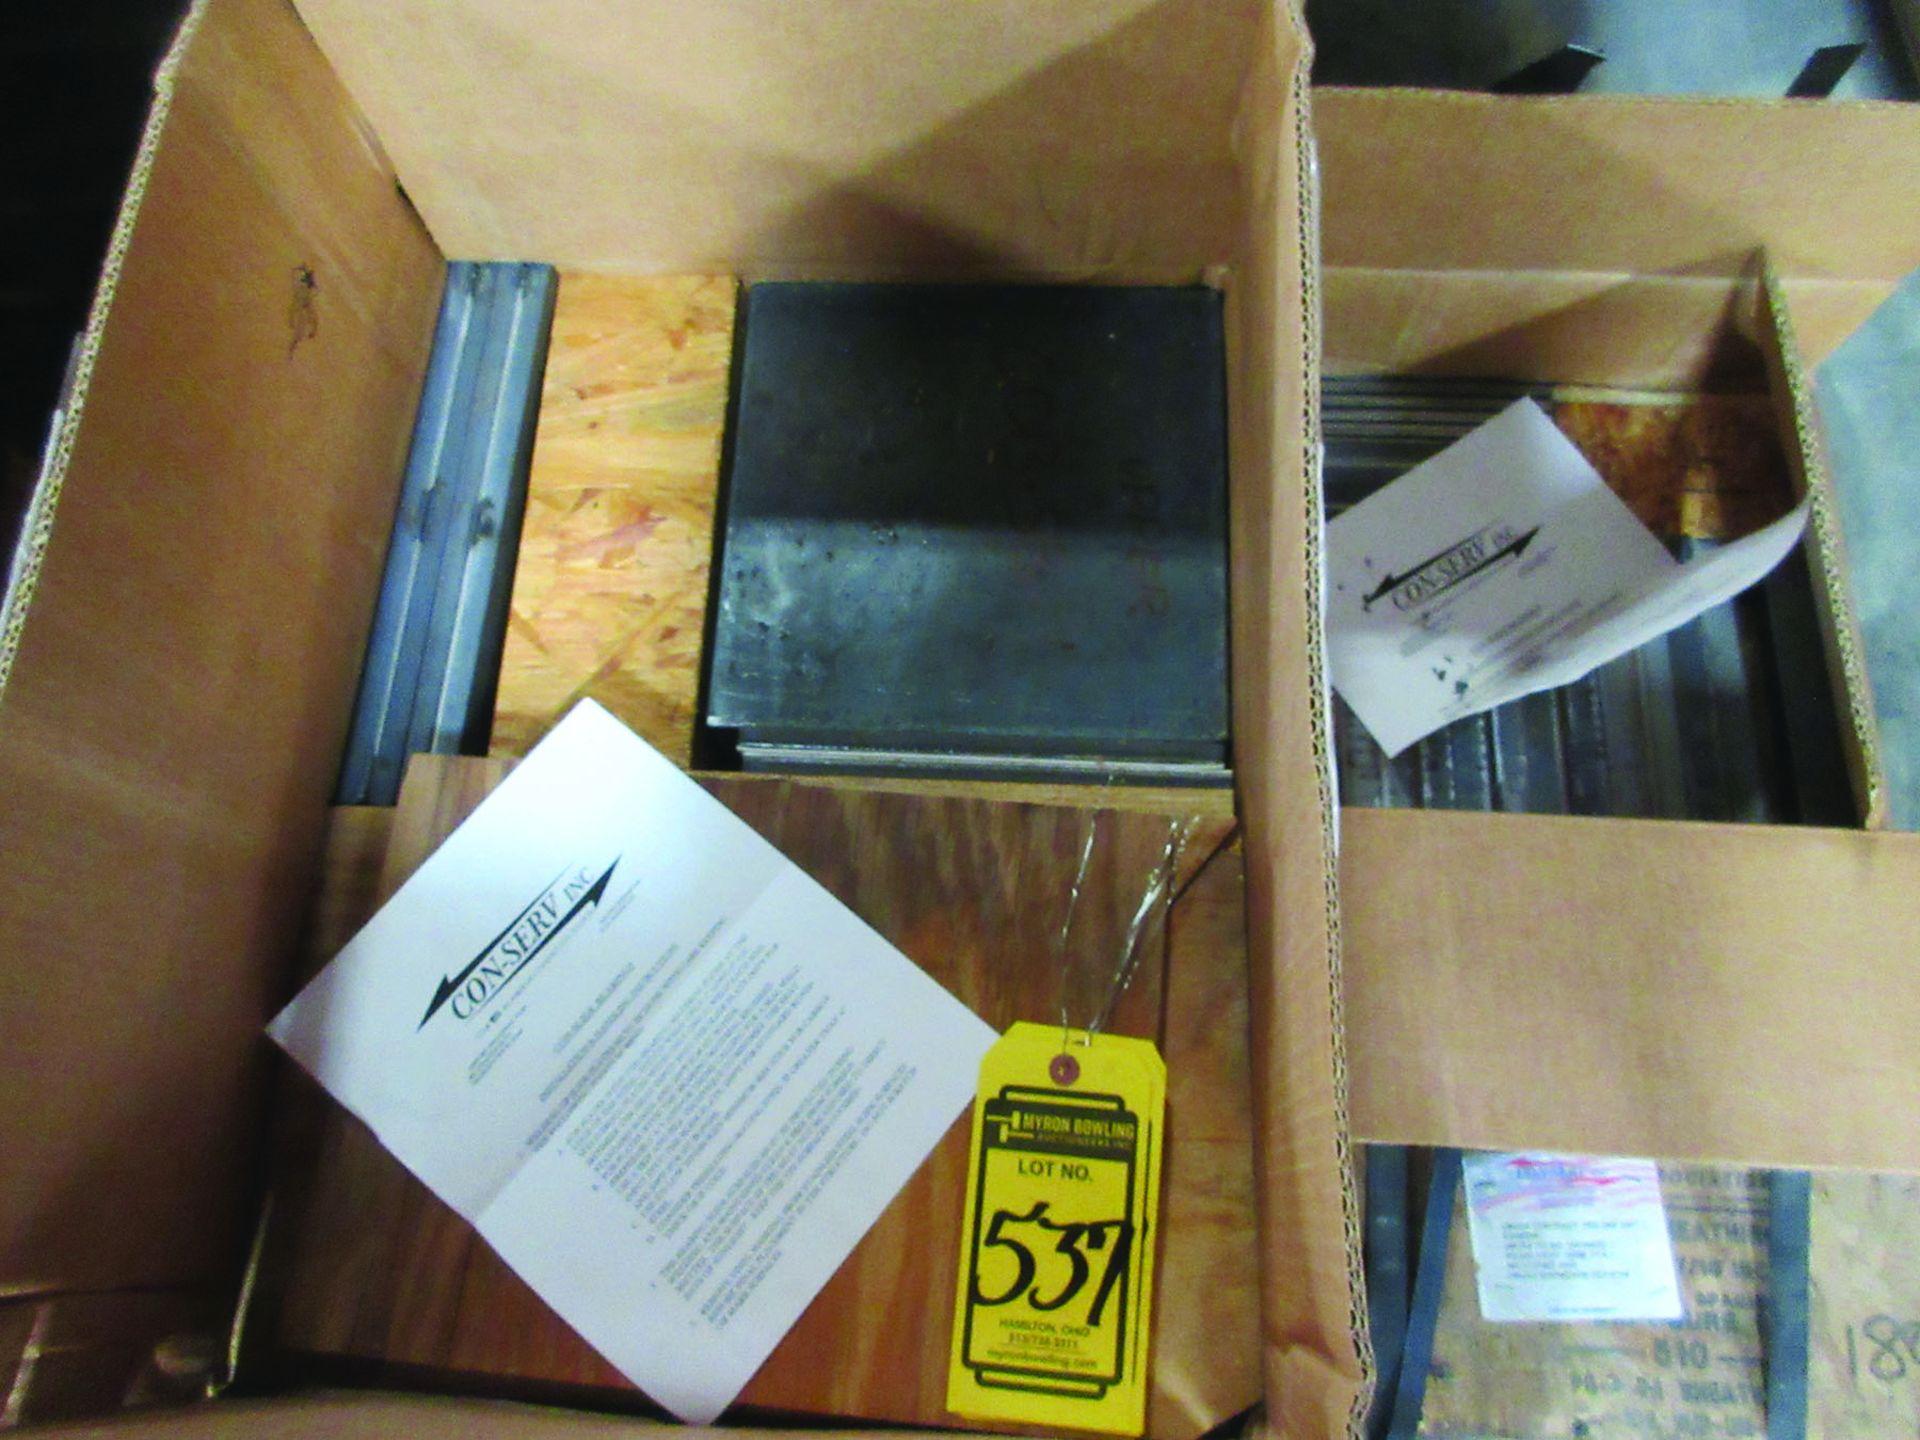 (8) NITROGEN FILLED RADIATORS, 5,000 LB EACH, DIMENSIONS 200'' X 80'' X 26'', (5) EXPANSION - Image 5 of 7